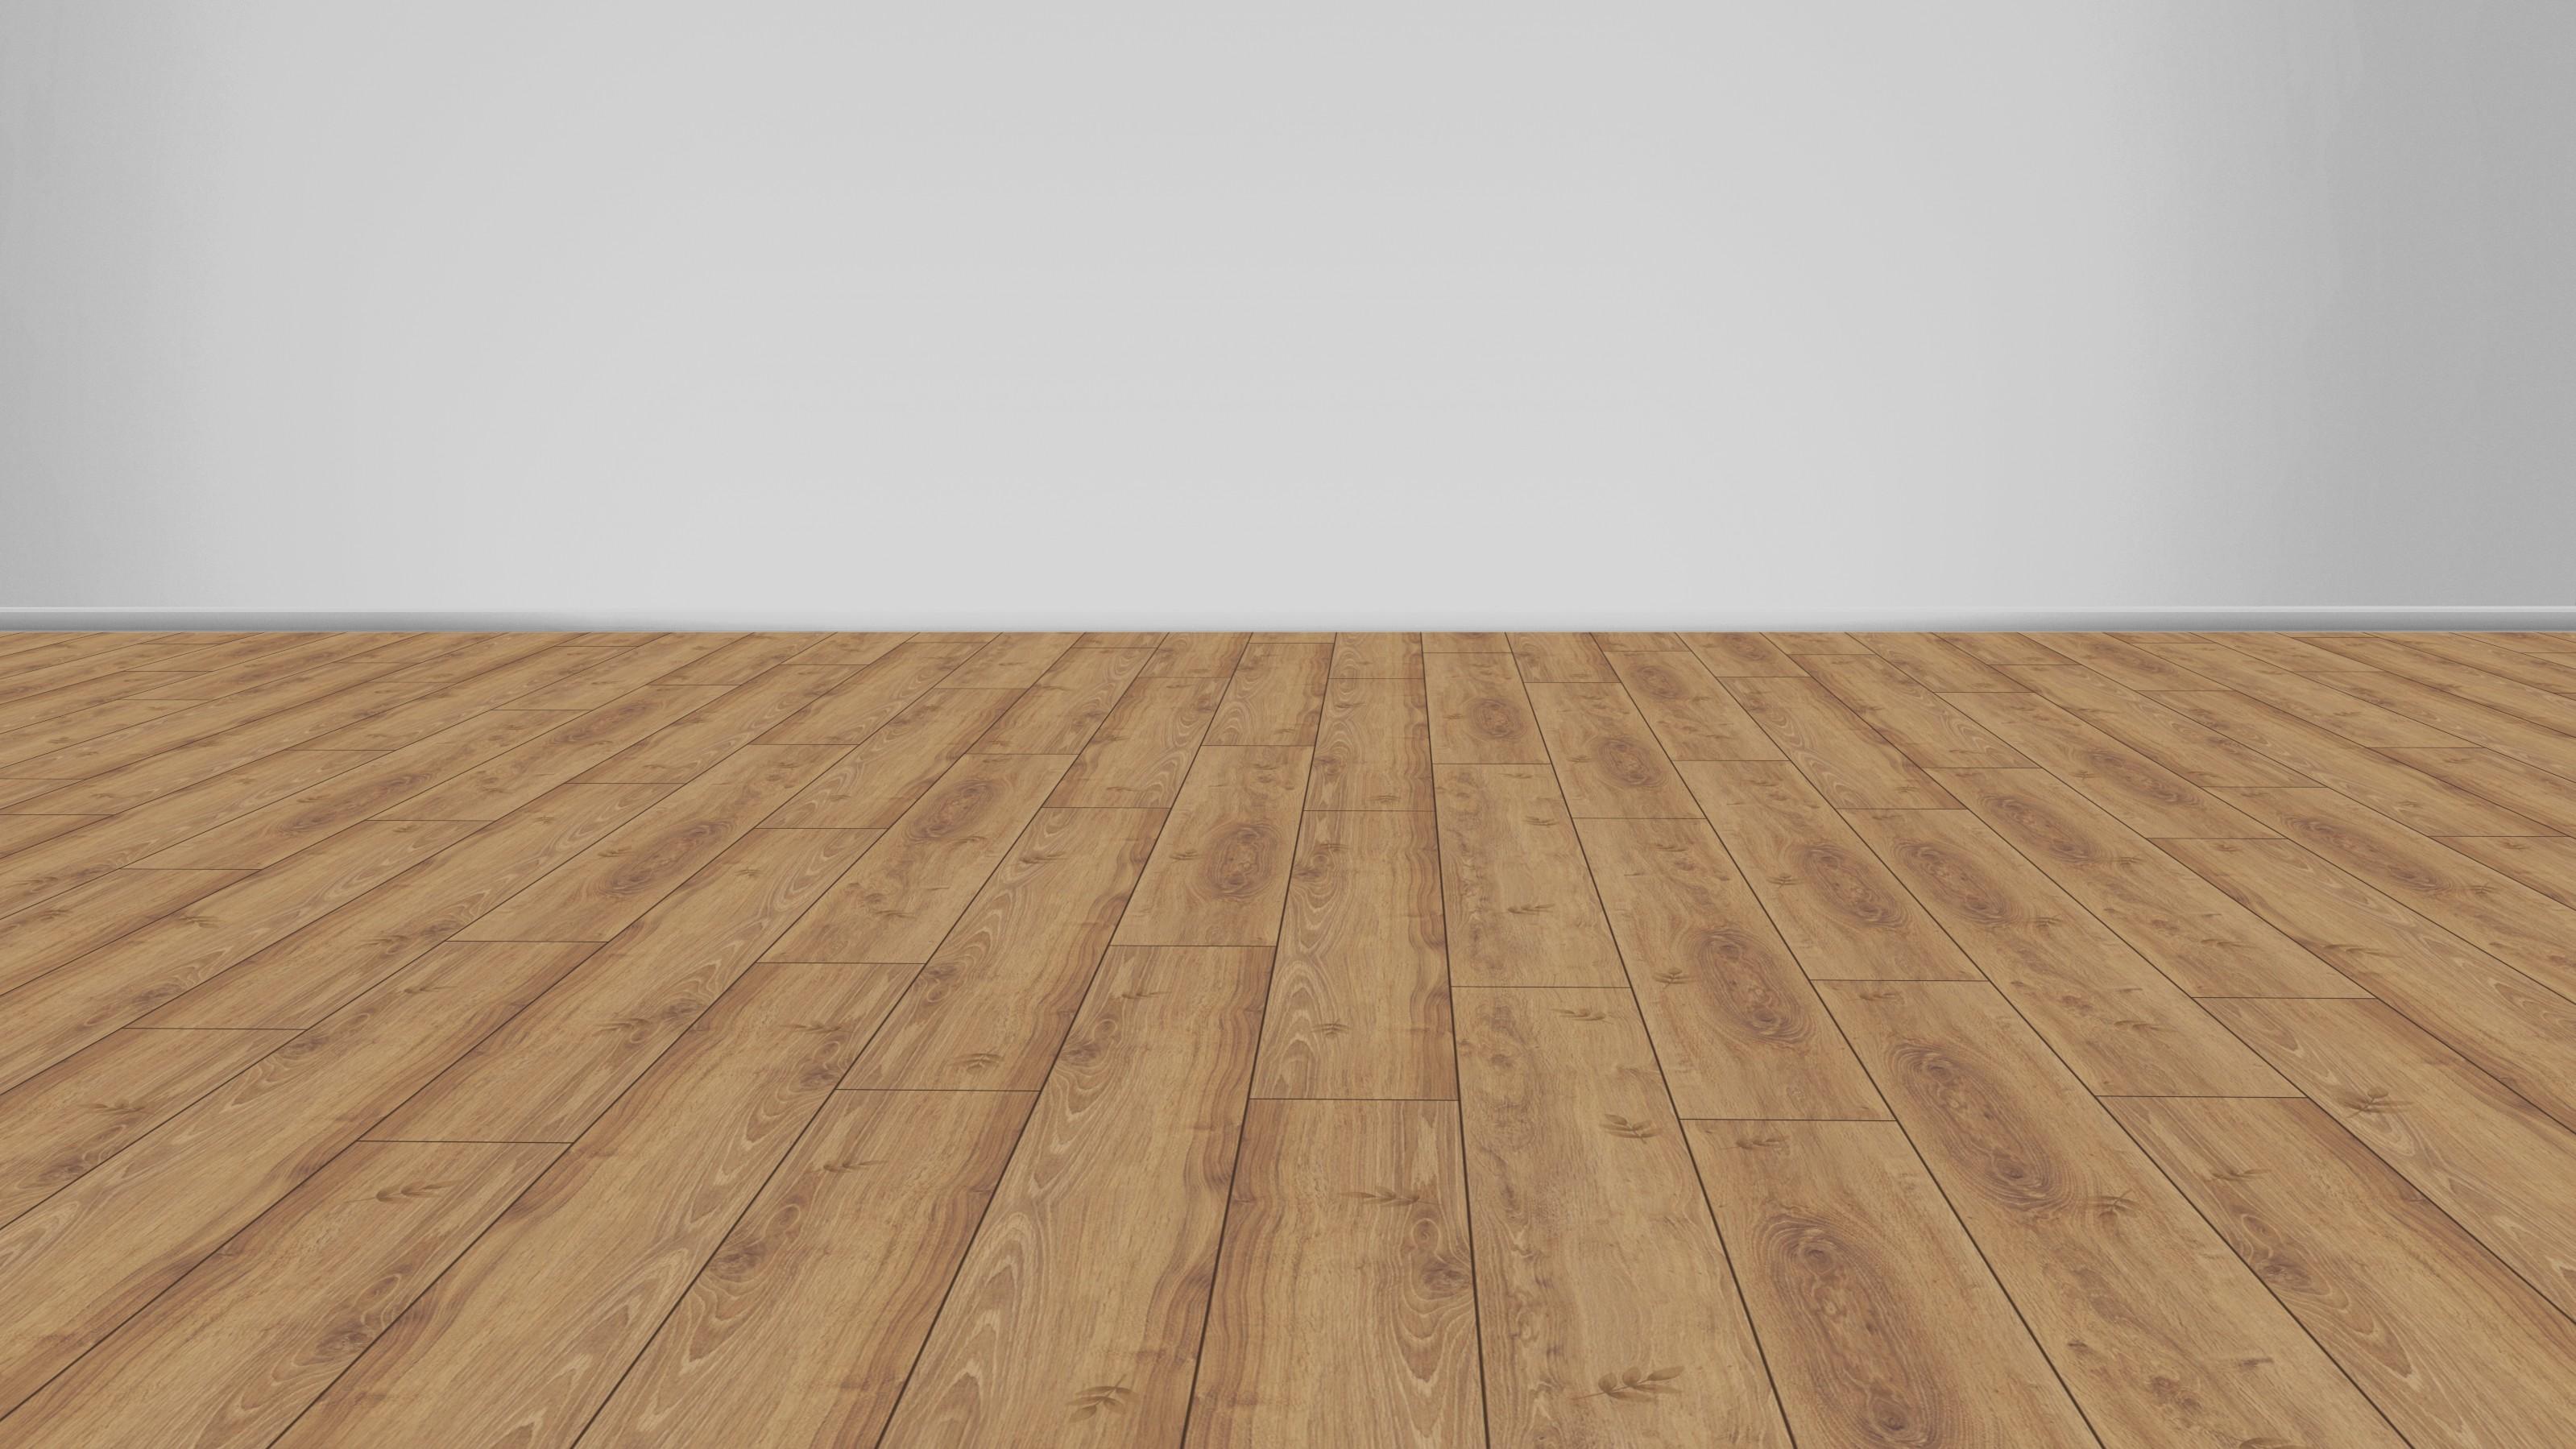 Brown leaf villeroy boch london premium laminate for Laminate flooring london